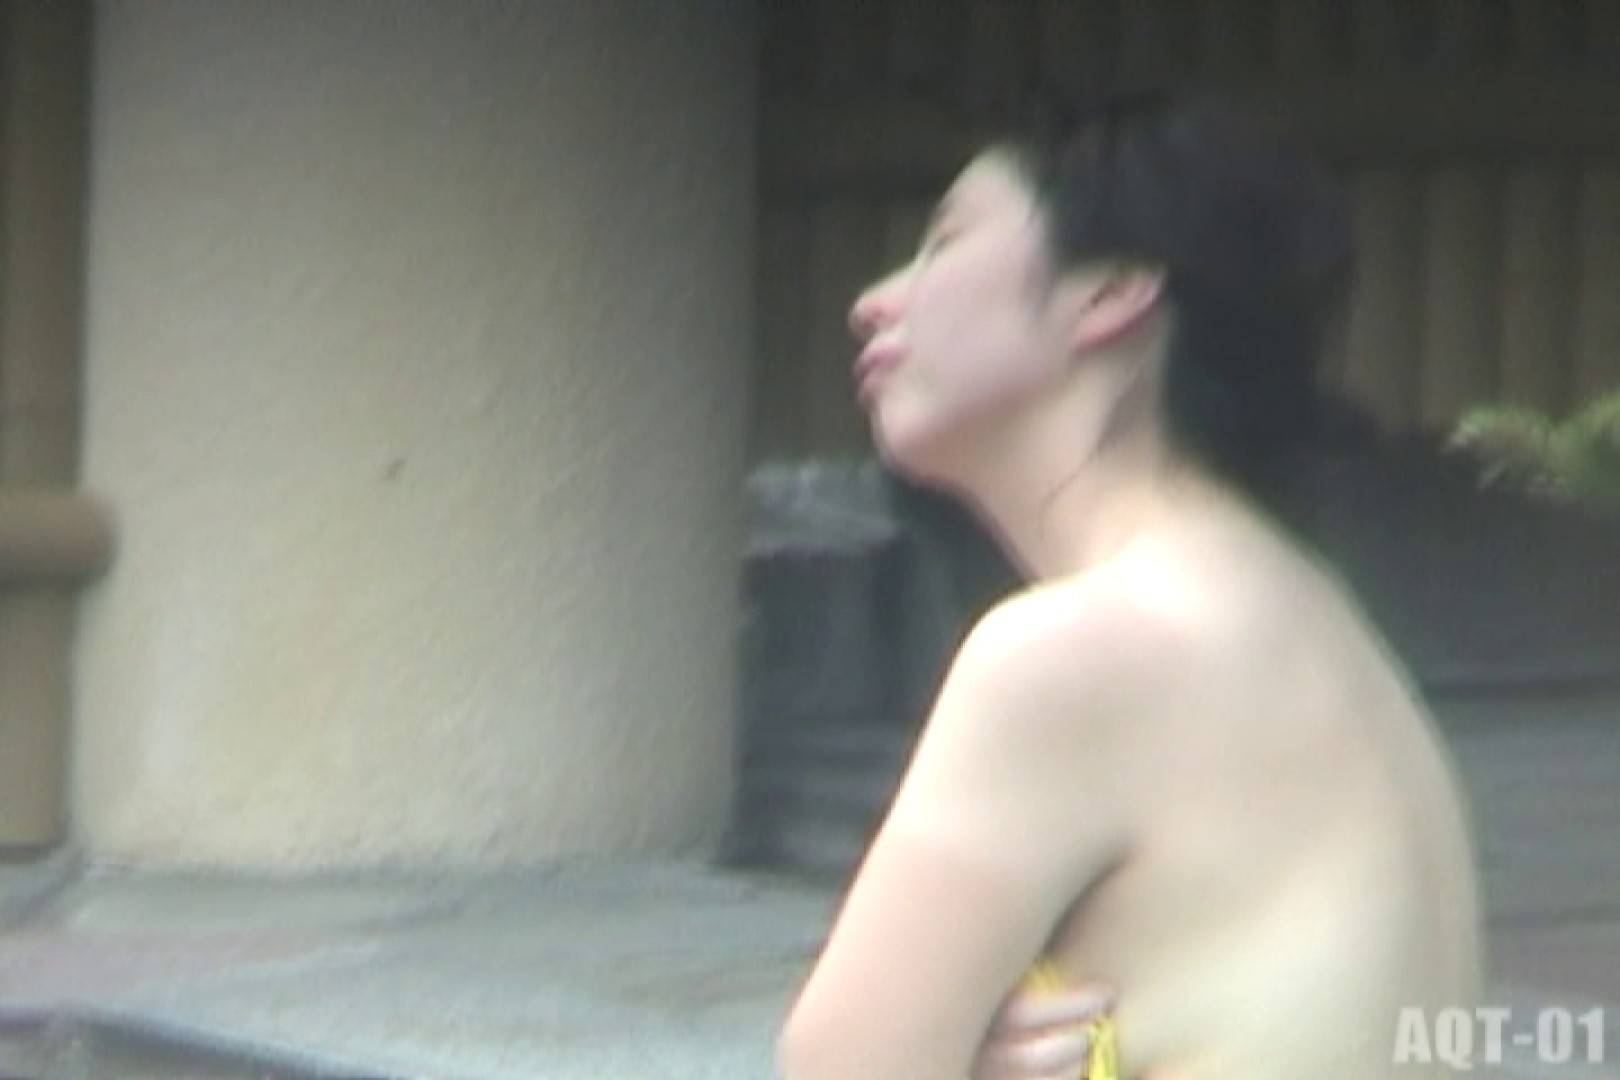 Aquaな露天風呂Vol.717 露天風呂編  111PIX 26